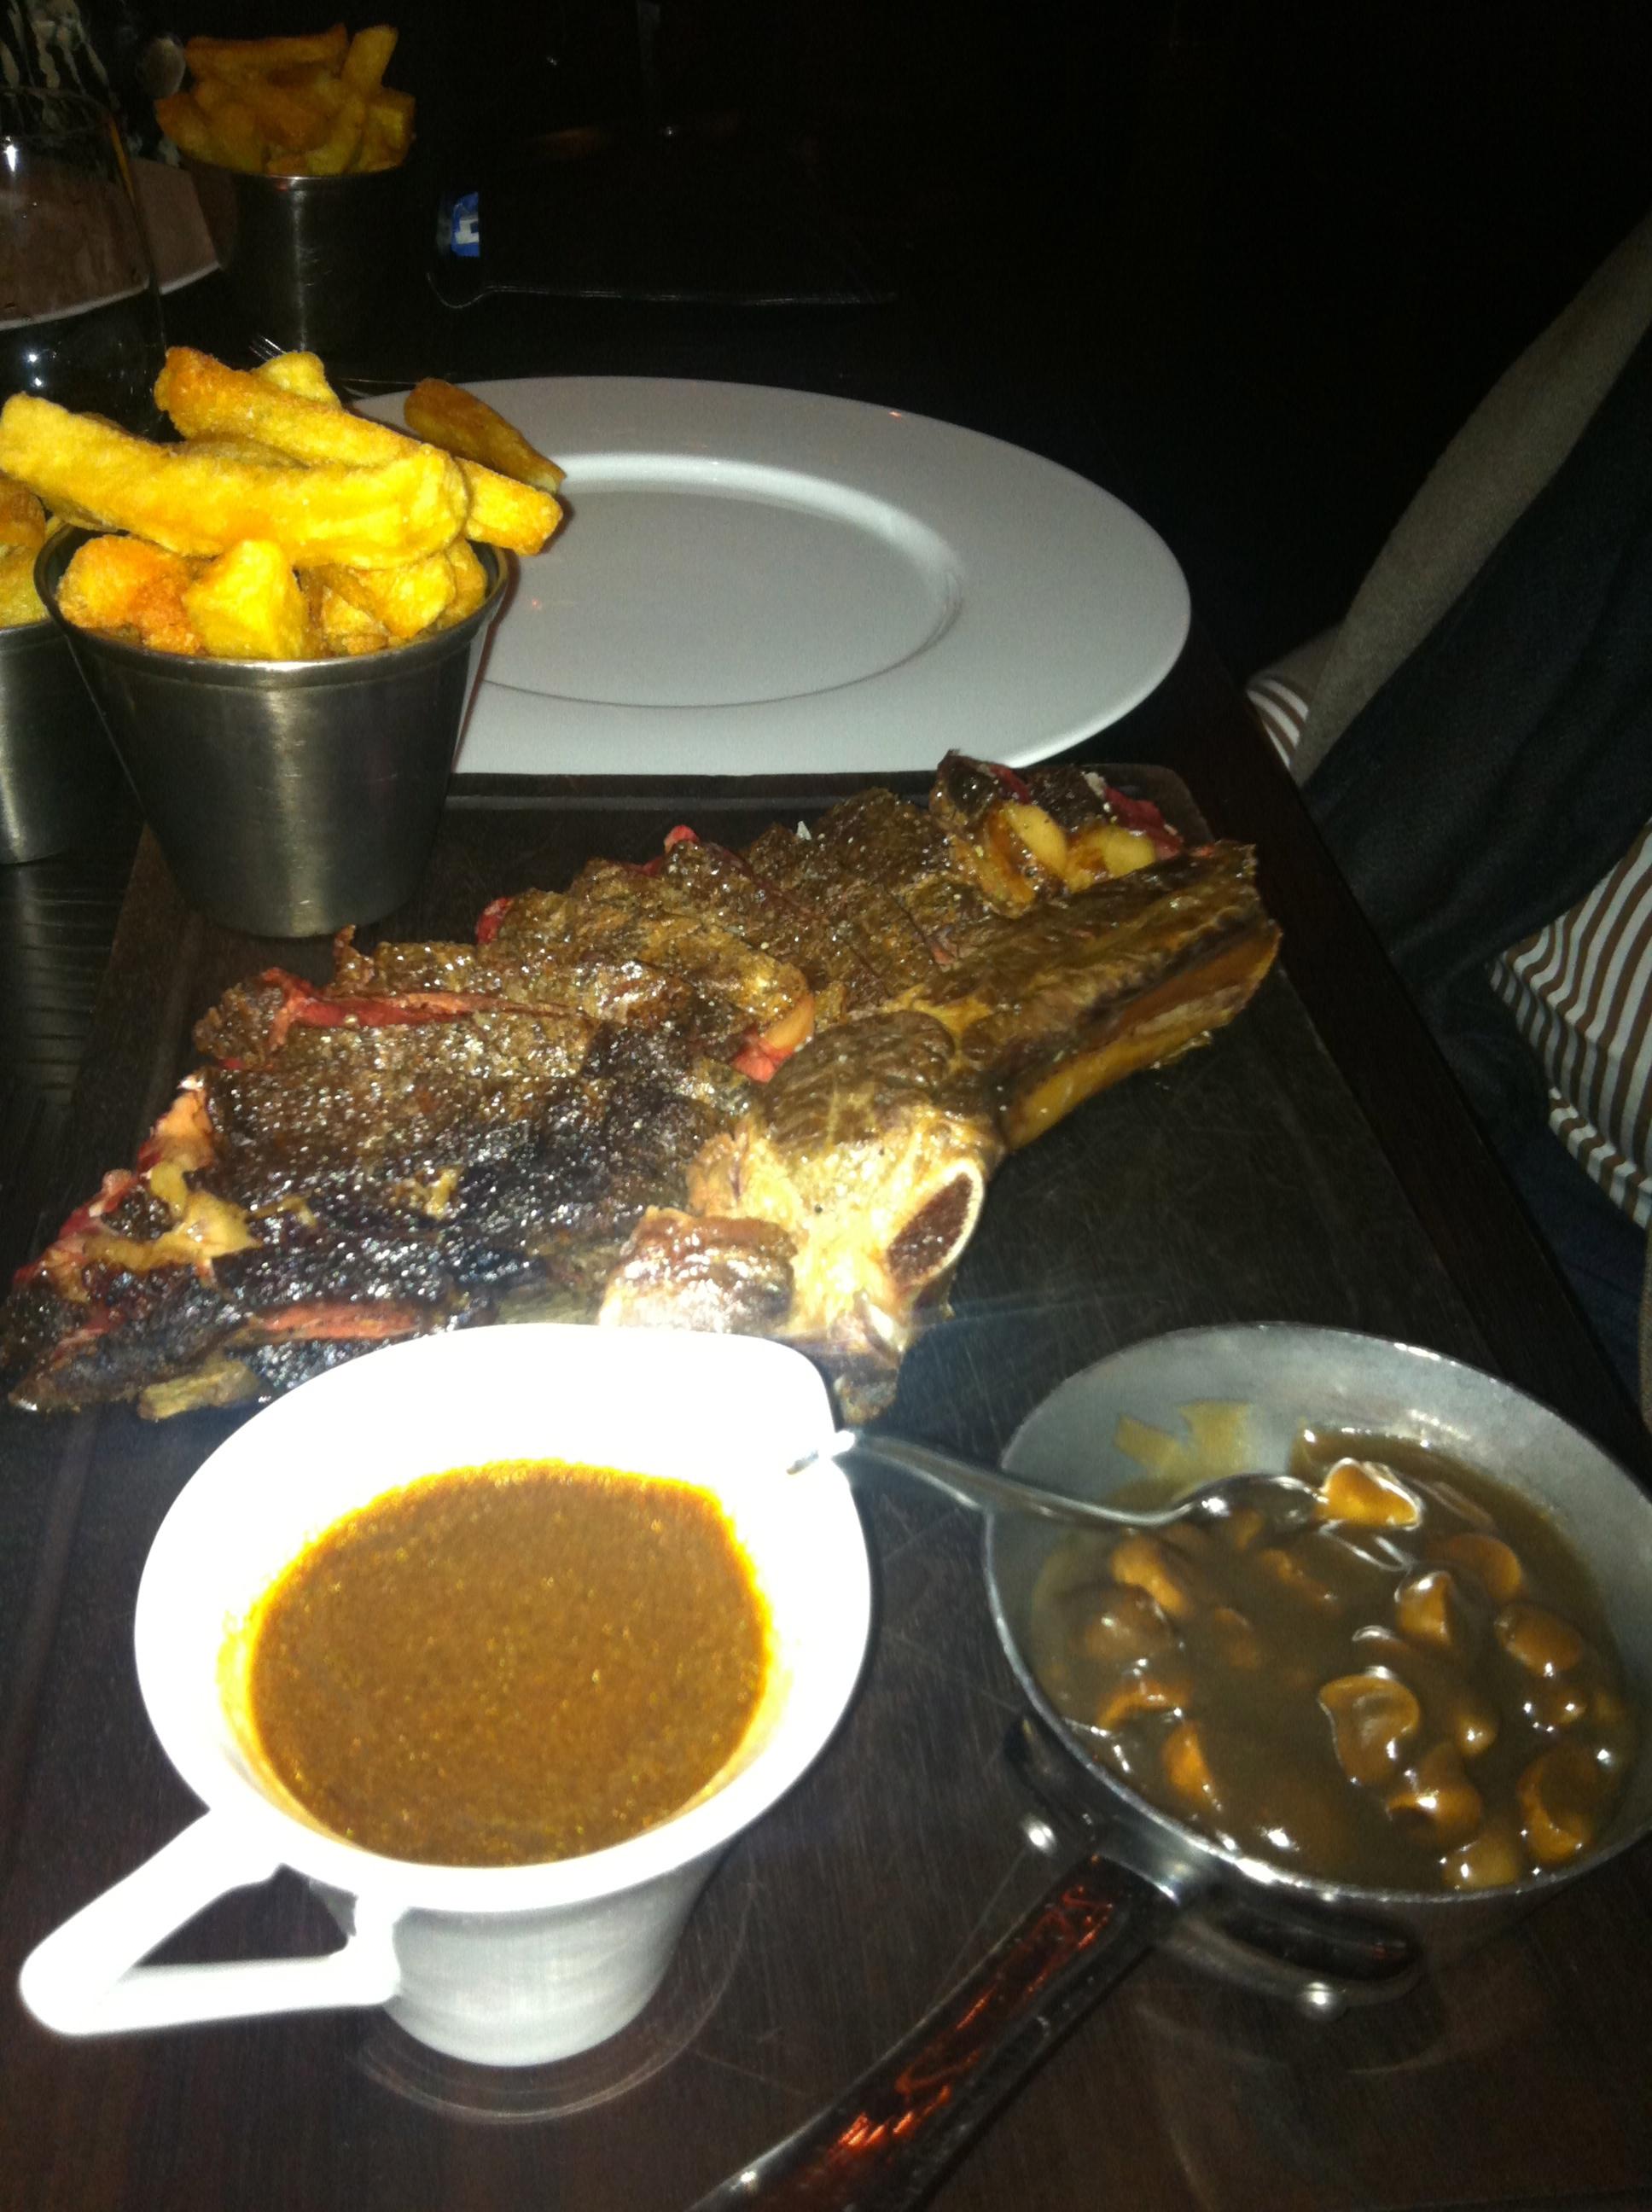 Hereford Prime beef